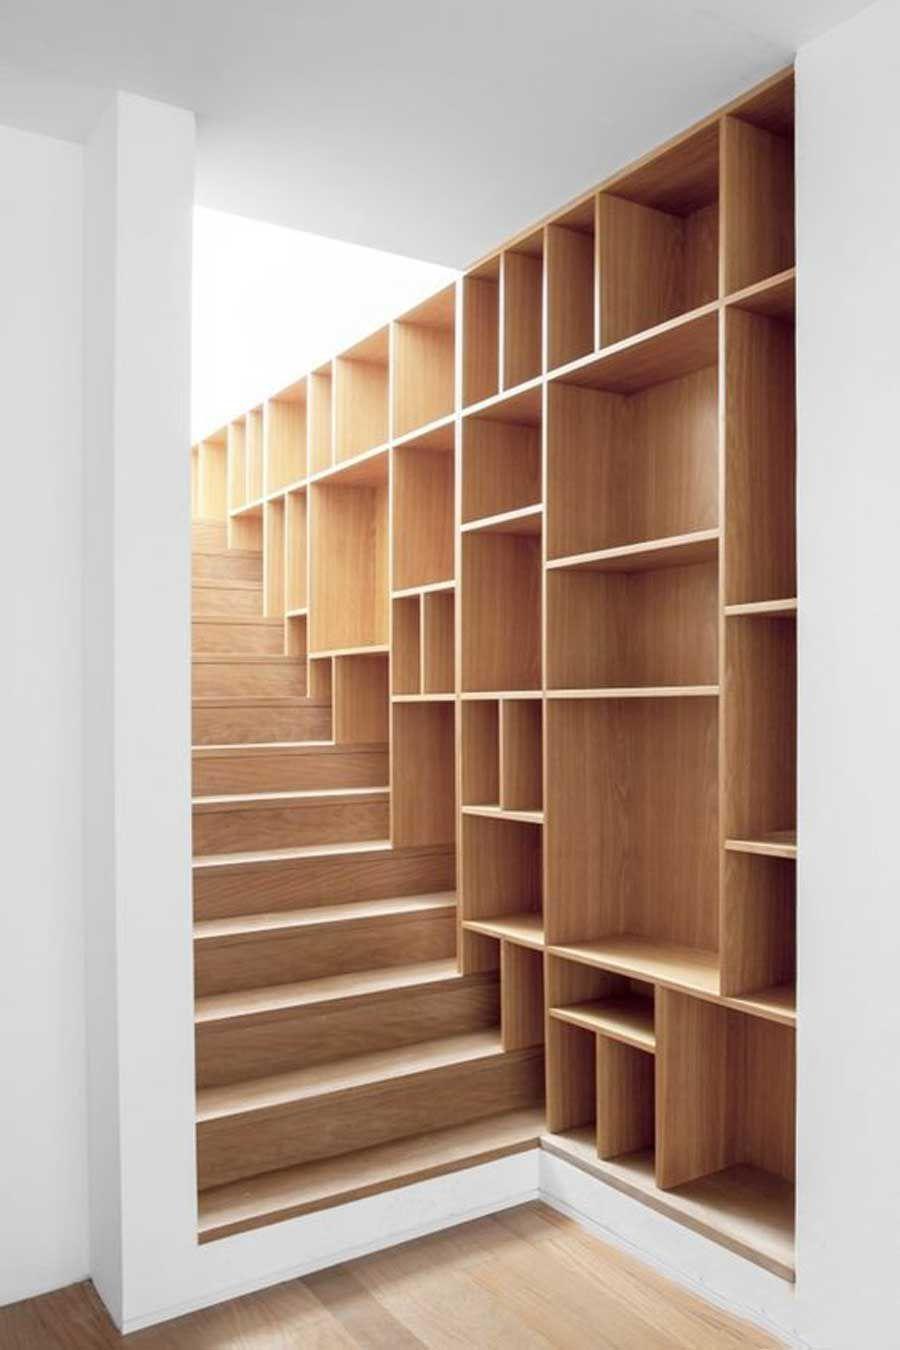 Intelligent interior saves space